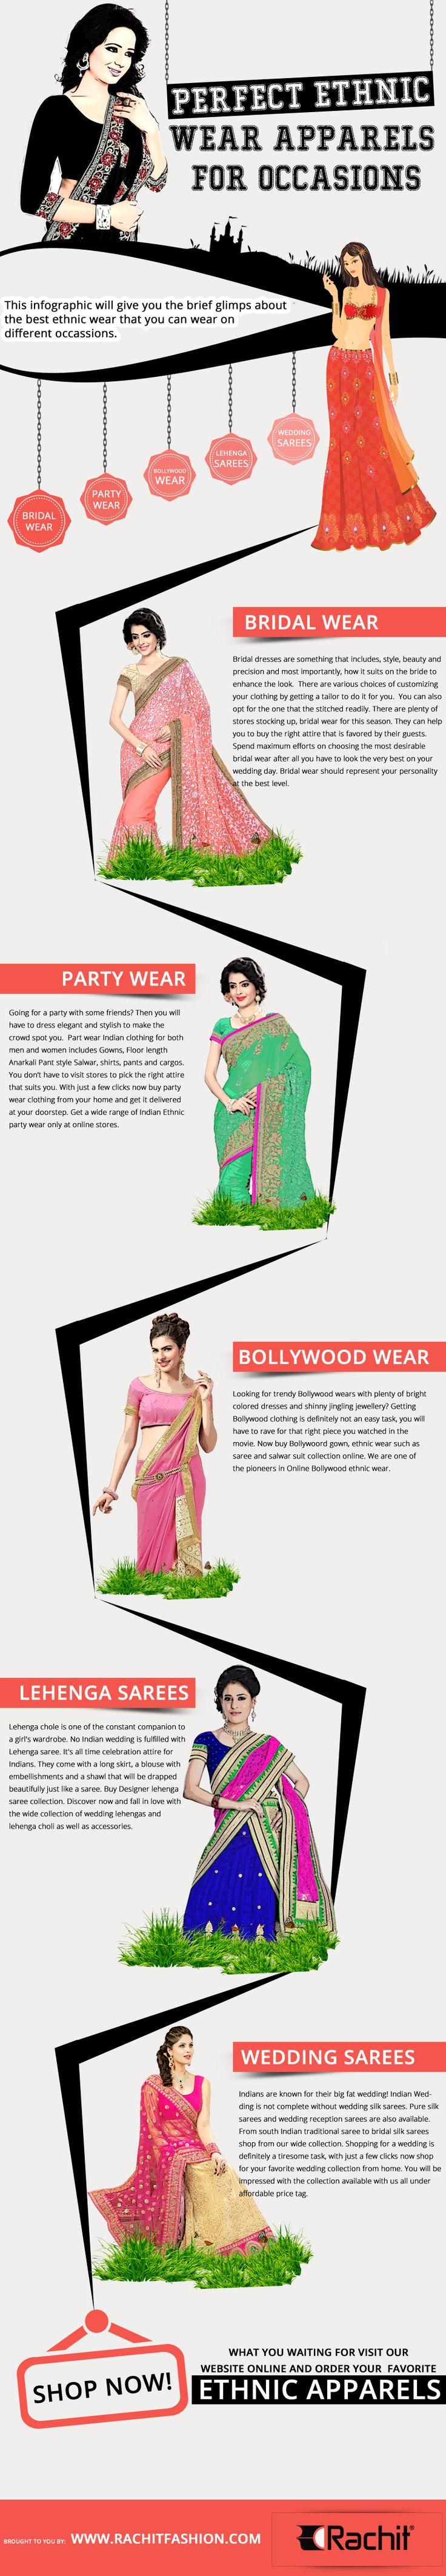 Perfect Ethnic Wear Apparels for Occasions.  #ethnicwear #apparels #womensfashion #clothing